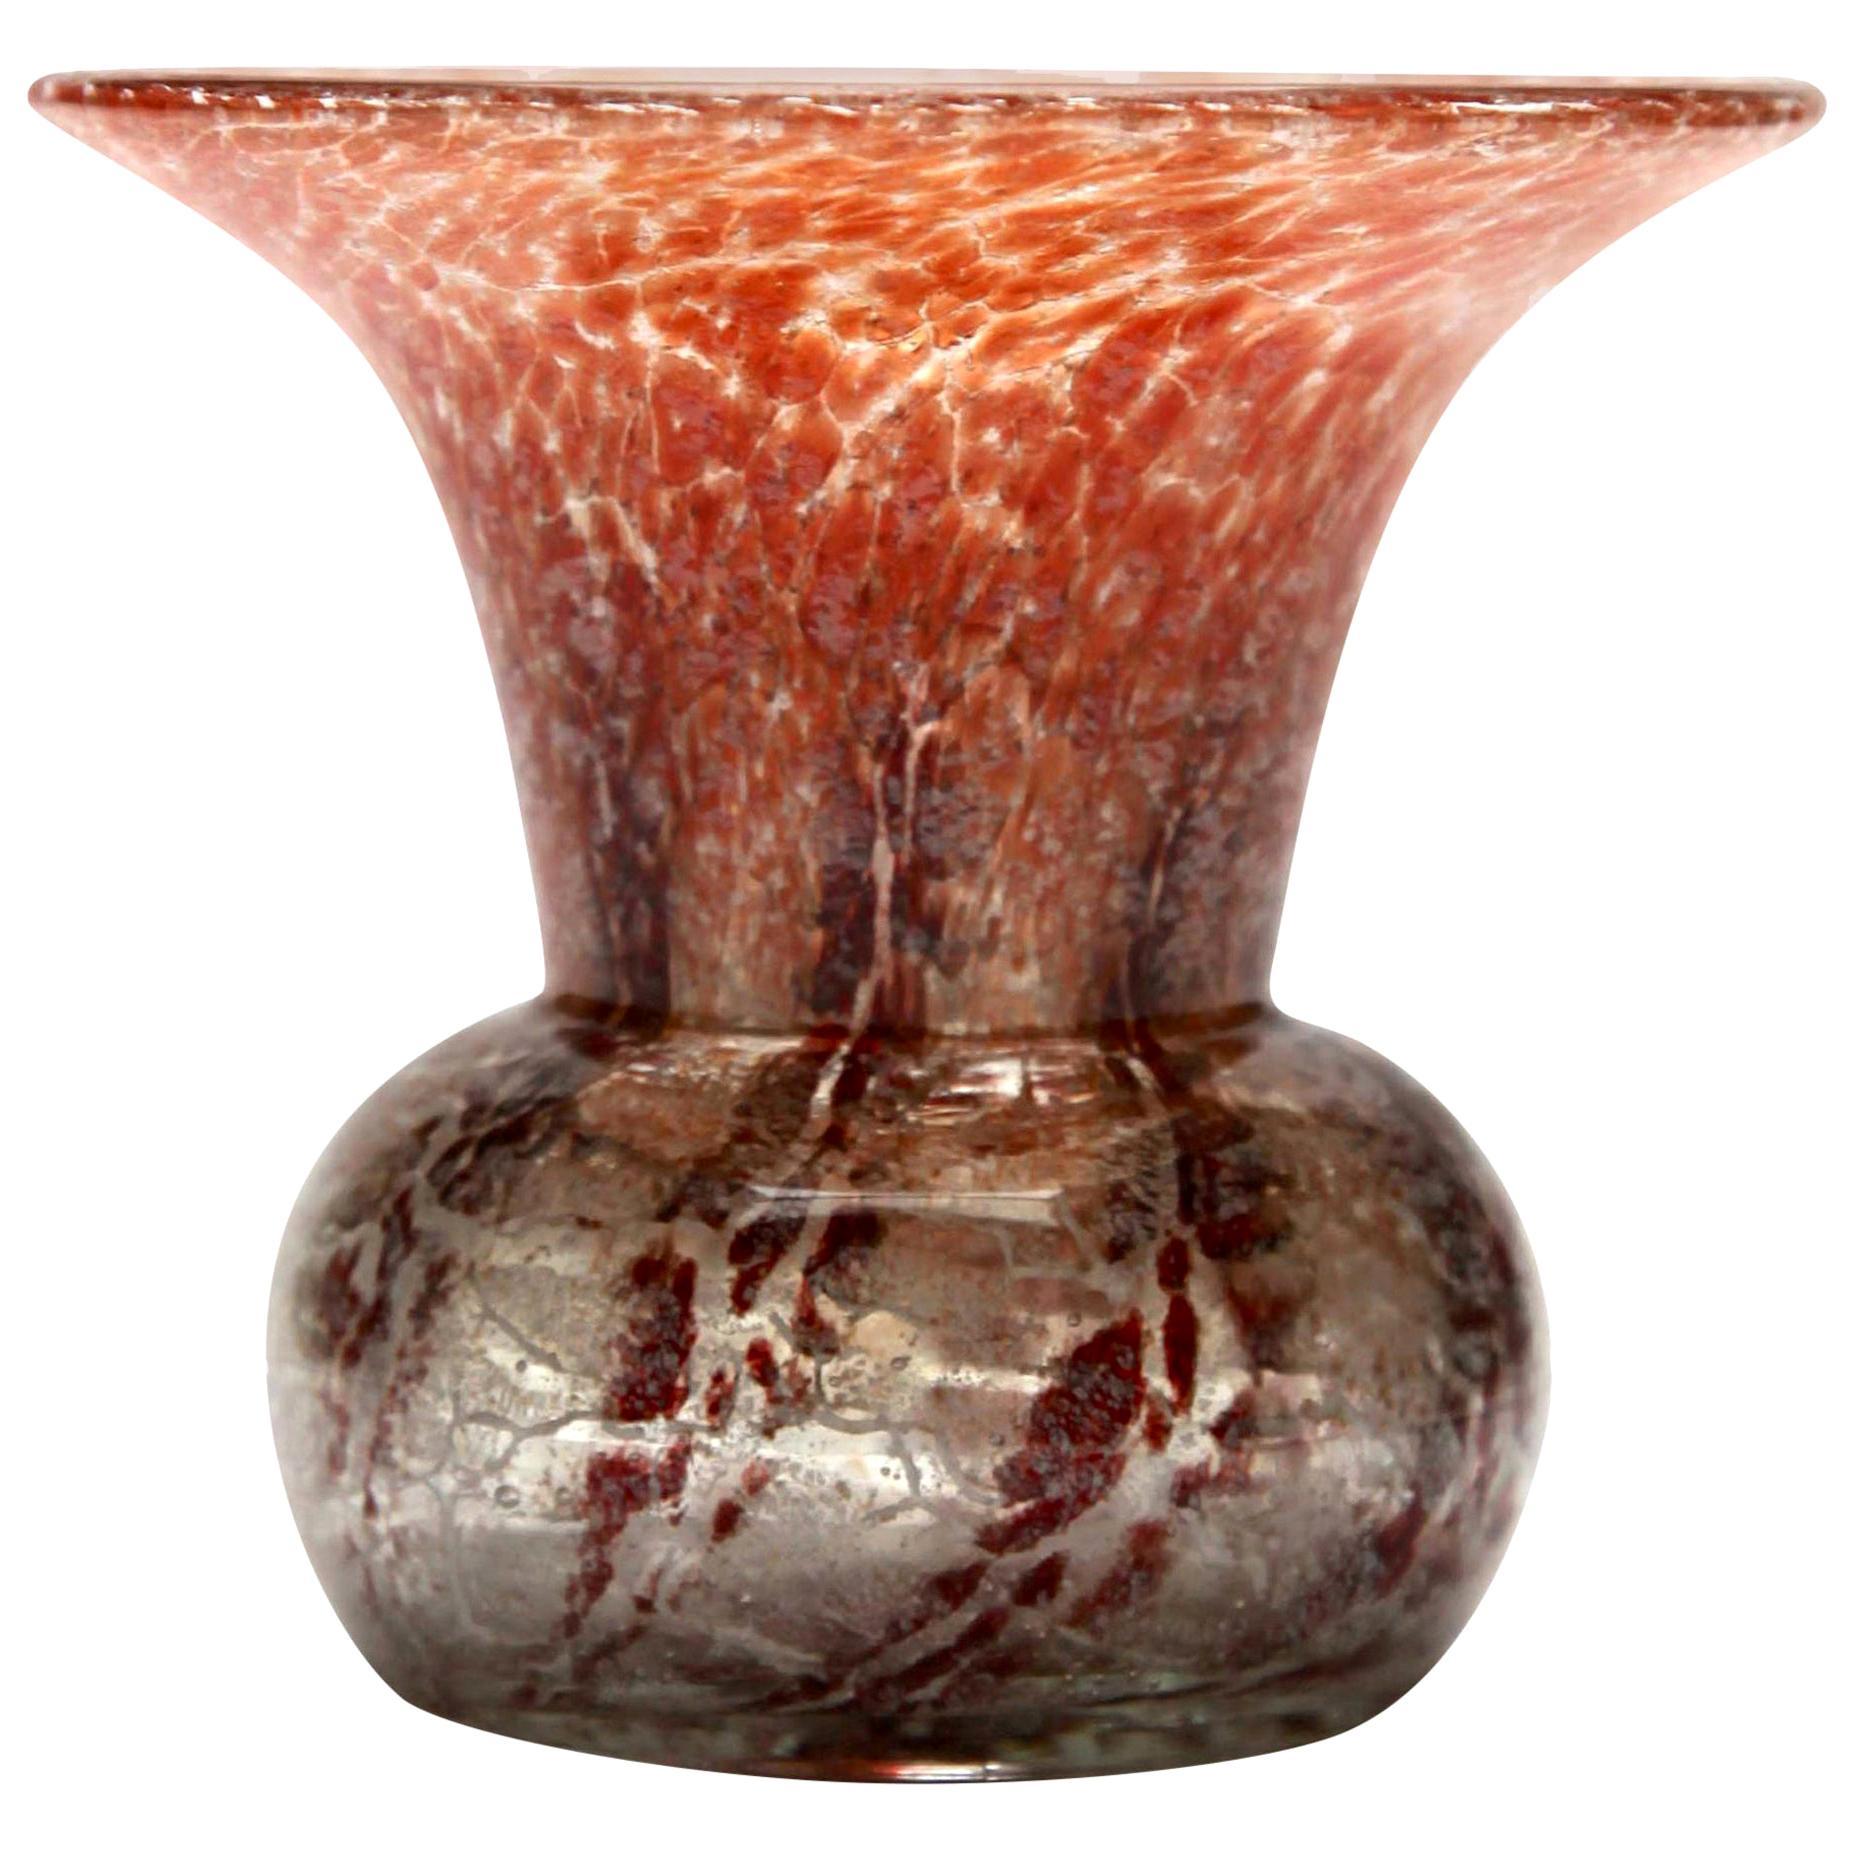 'Ikora' Art Glass Vase, Produced, by WMF in Germany, 1930s by Karl Wiedmann